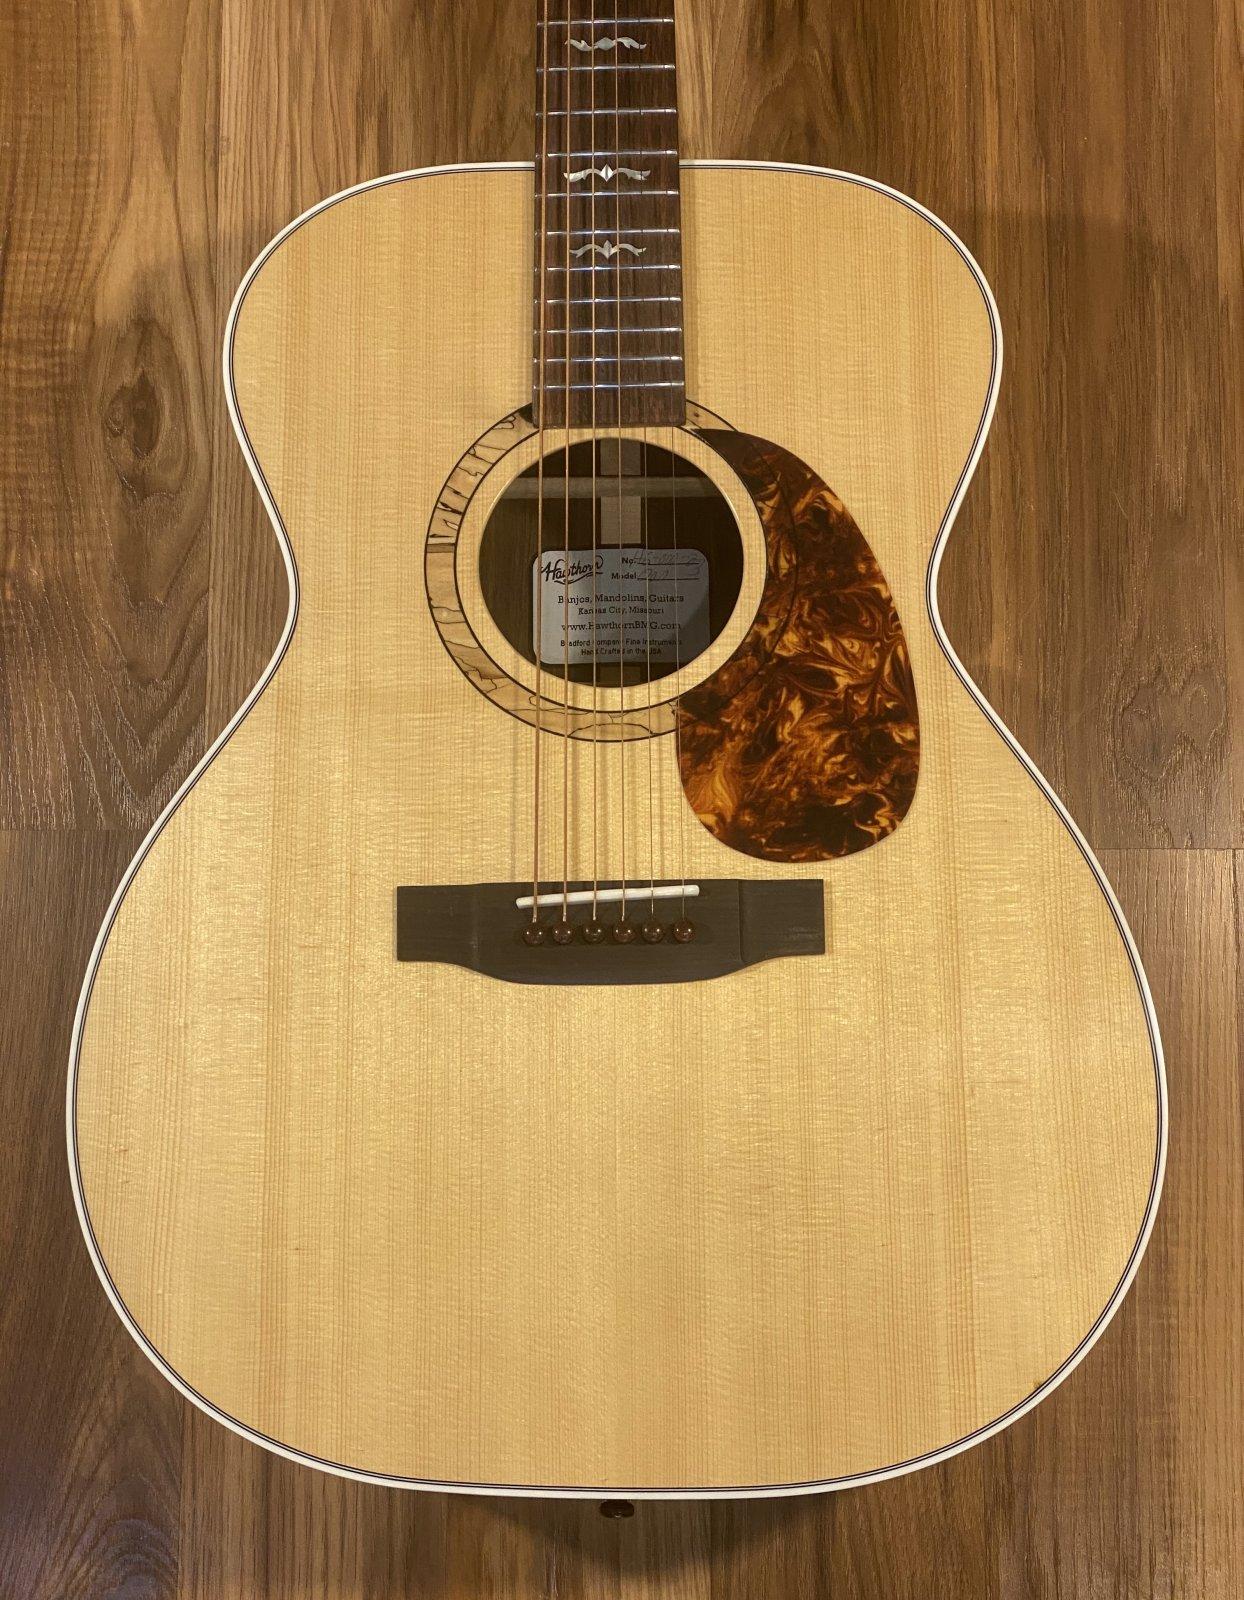 Hawthorn 000 Acoustic Guitar Adirondack Spruce/Indian Rosewood